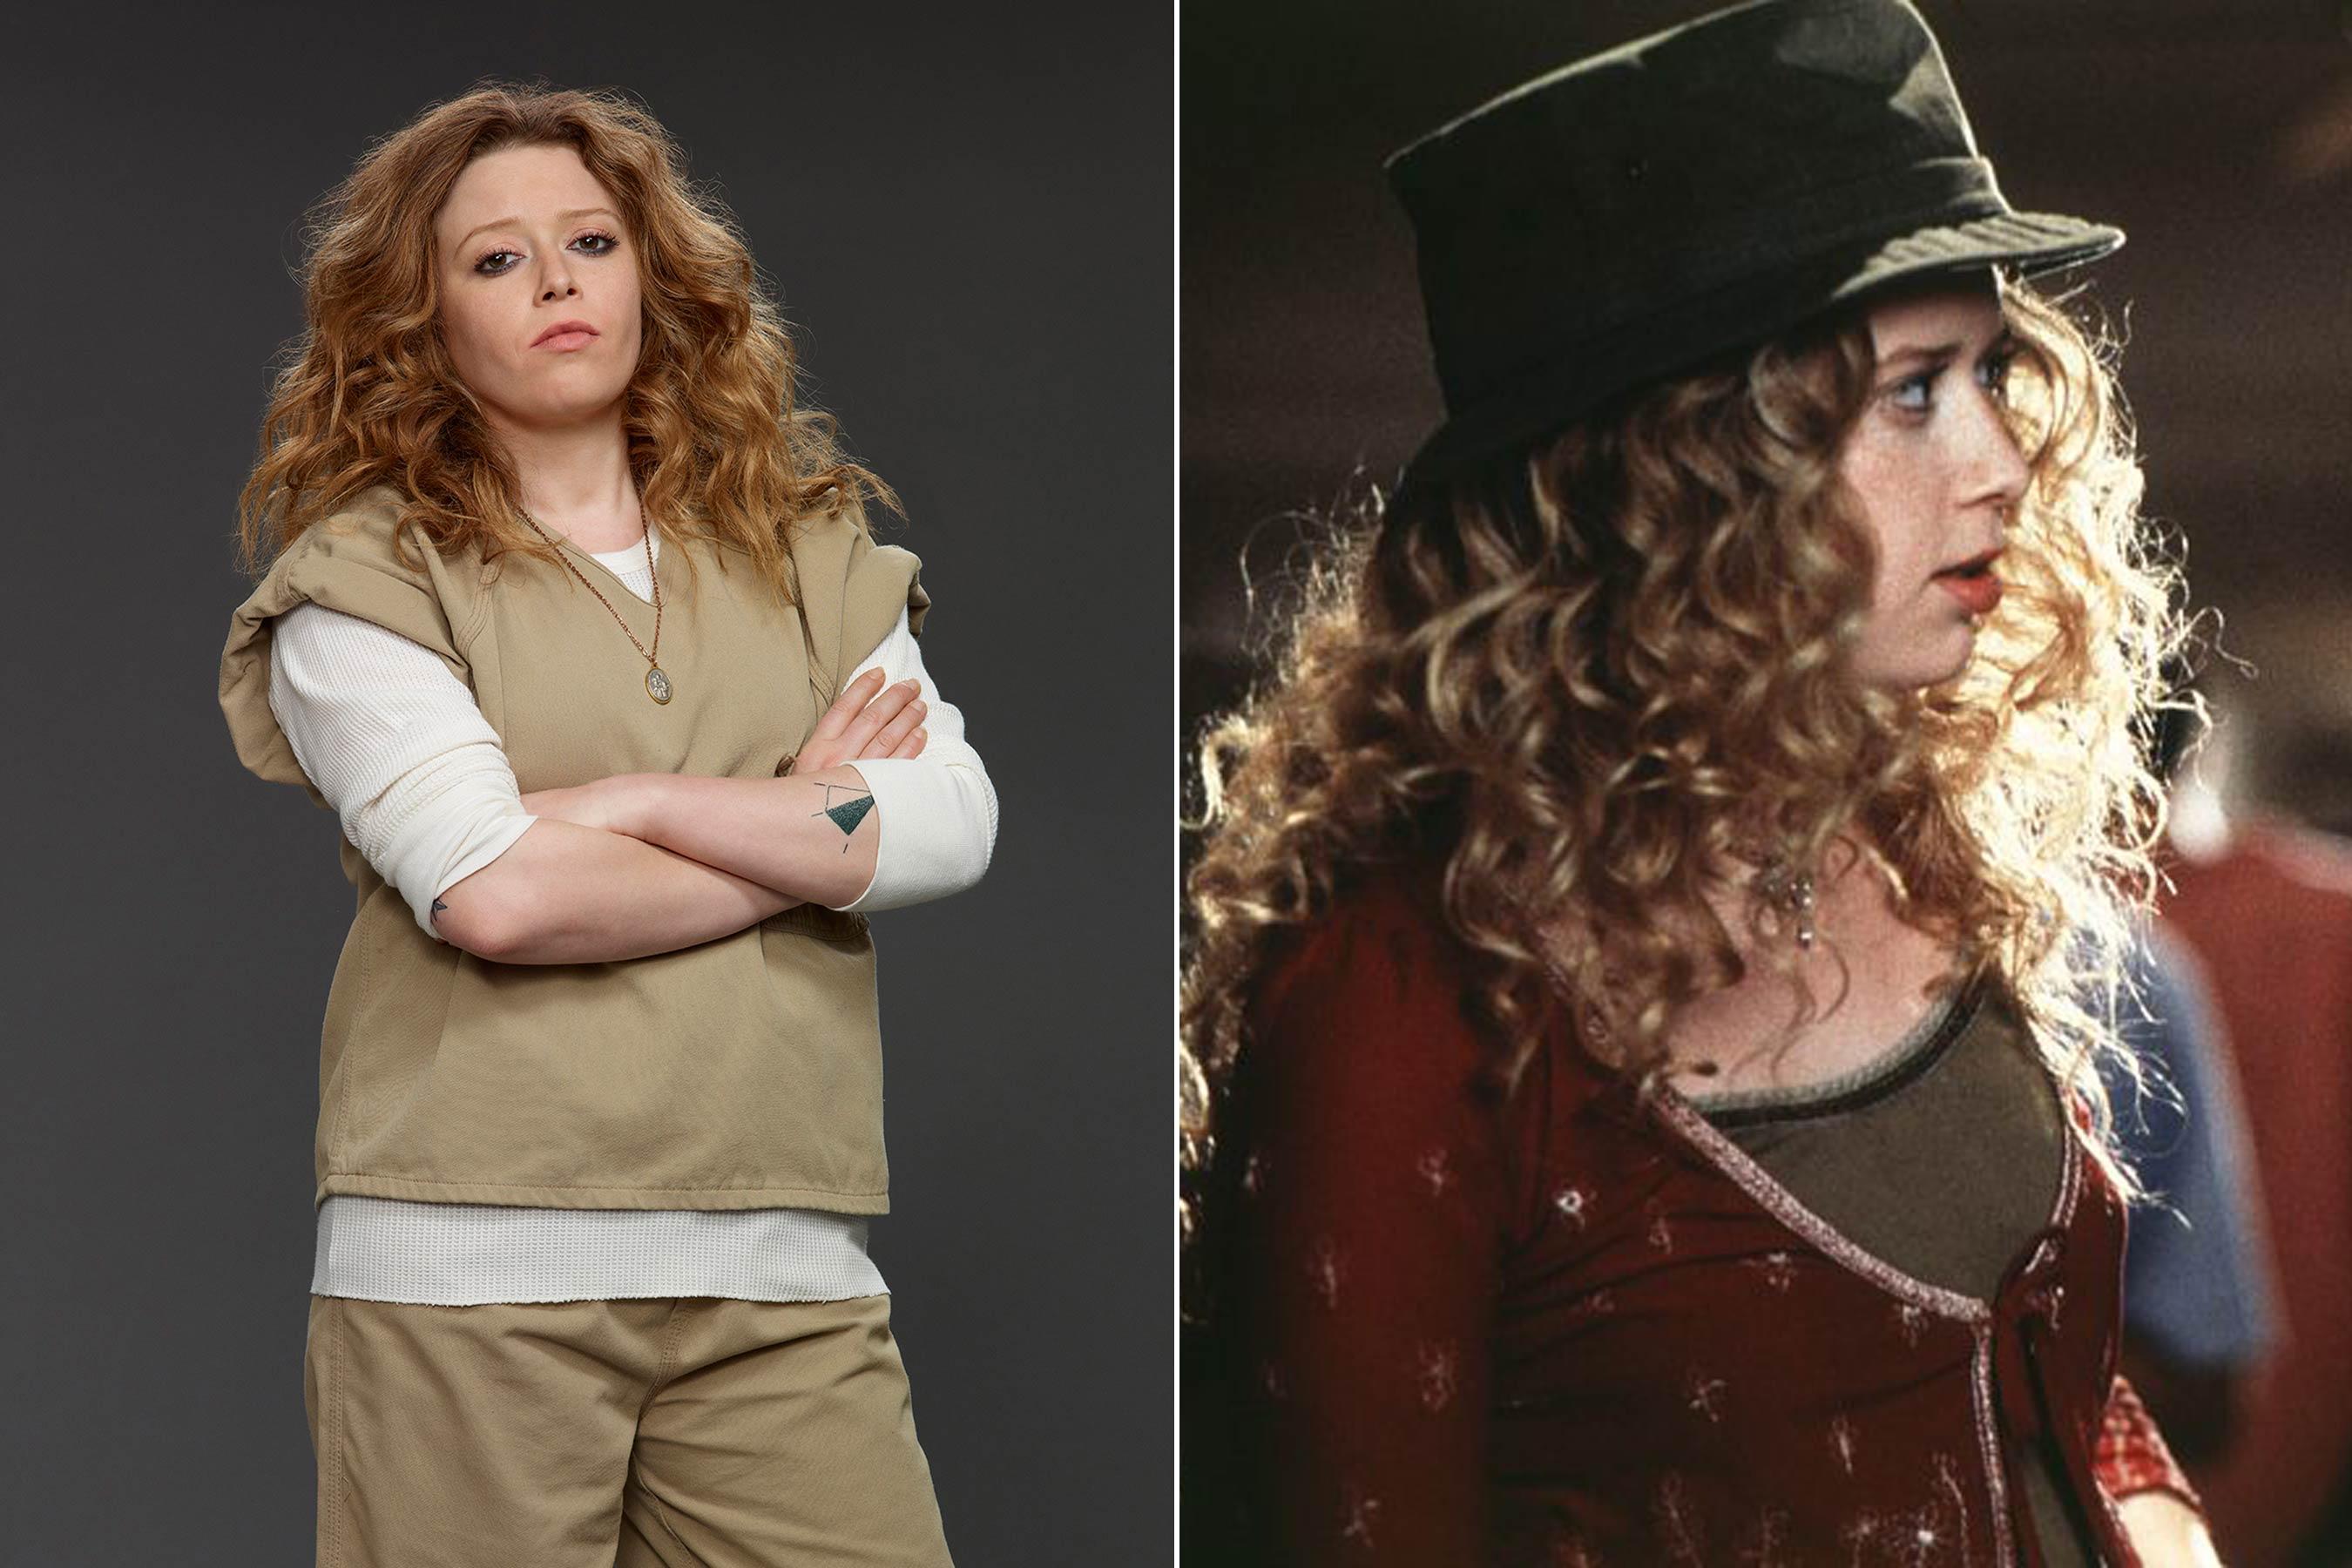 Before Natasha Lyonne played Nicky Nichols on Orange Is the New Black she played Jessica on American Pie.